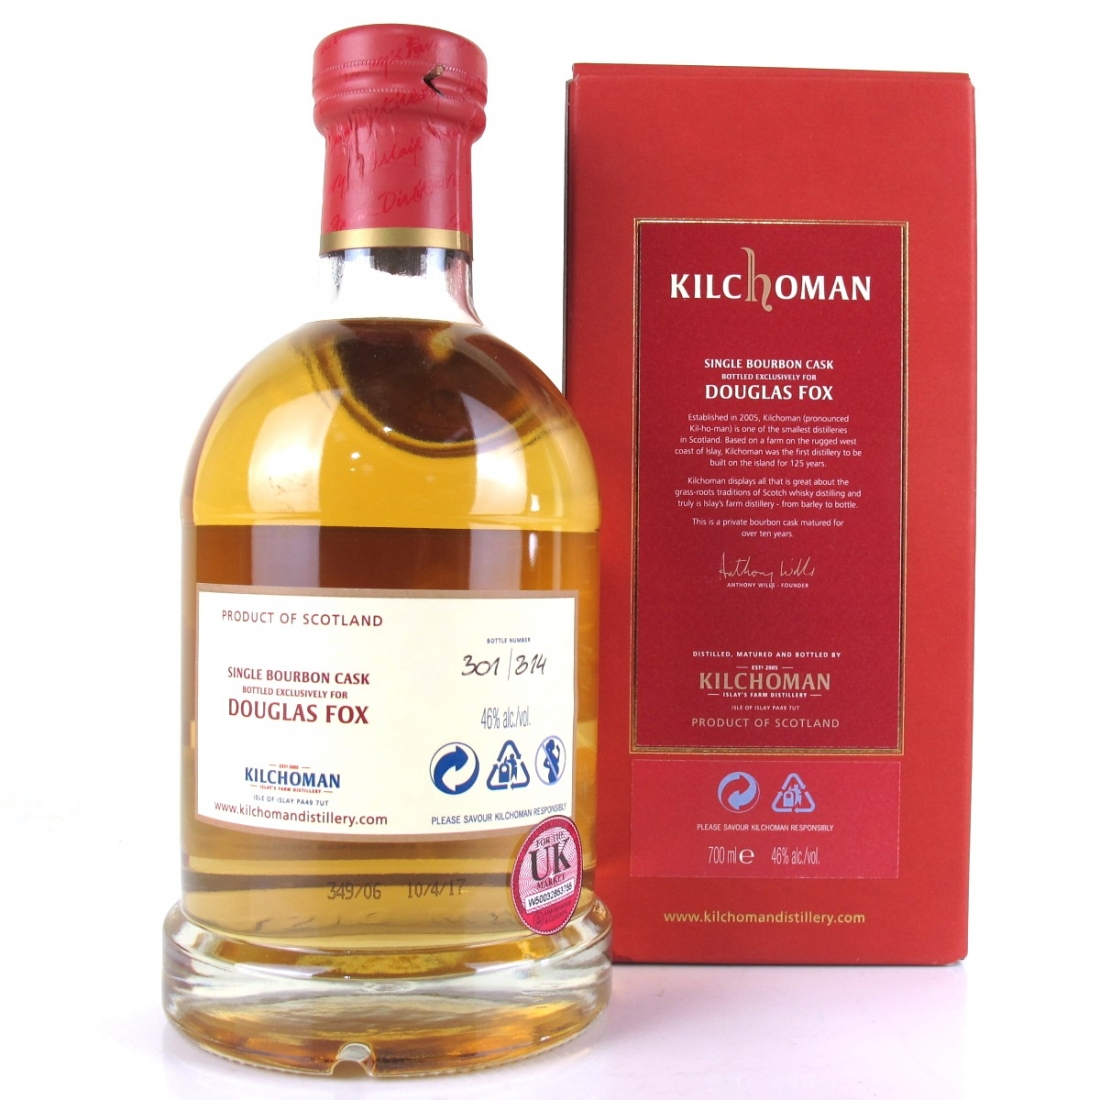 Kilchoman 2006 Private Cask Release 10 Year Old / Douglas Fox